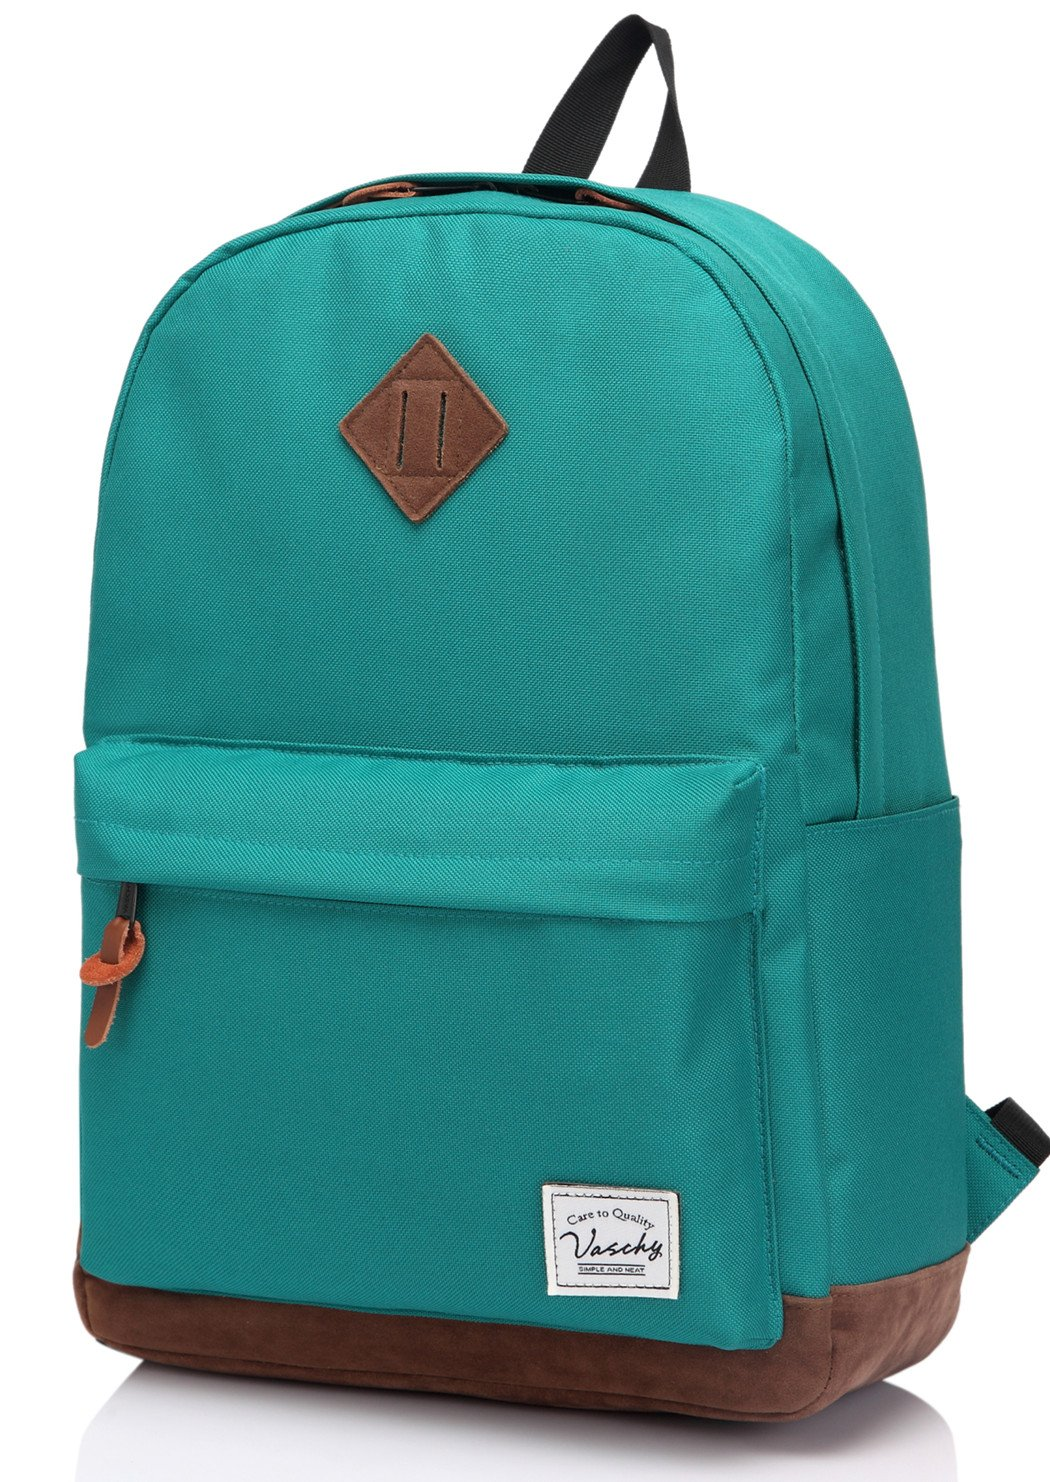 Vaschy Backpack Compartment Lightweight Rucksack